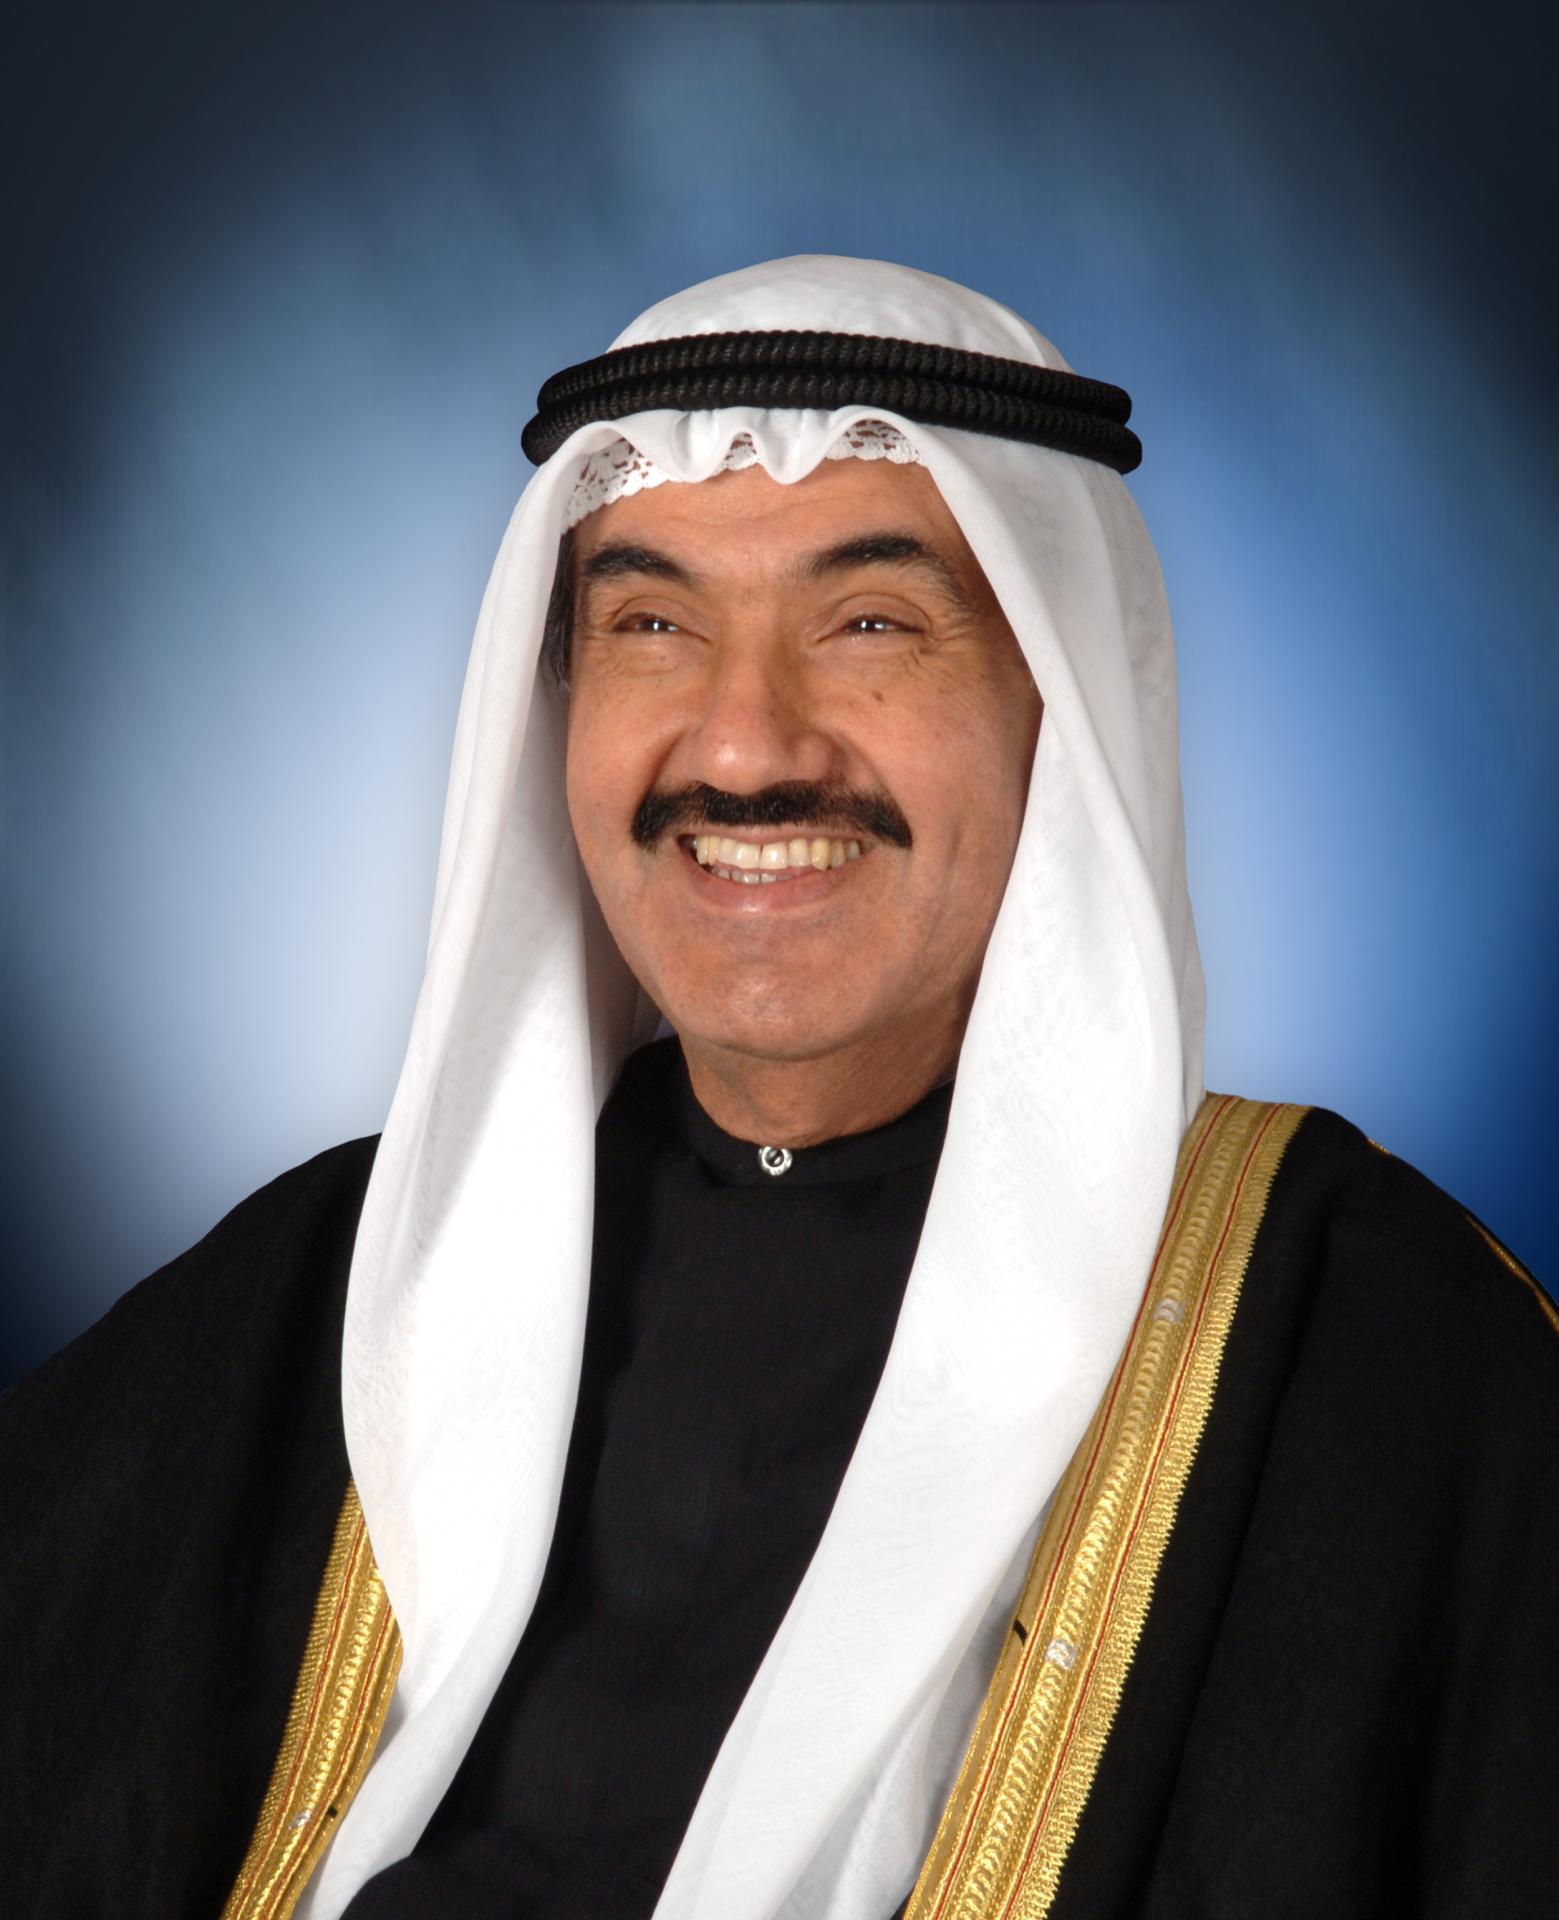 Nasser bin sabah al ahmad al sabah